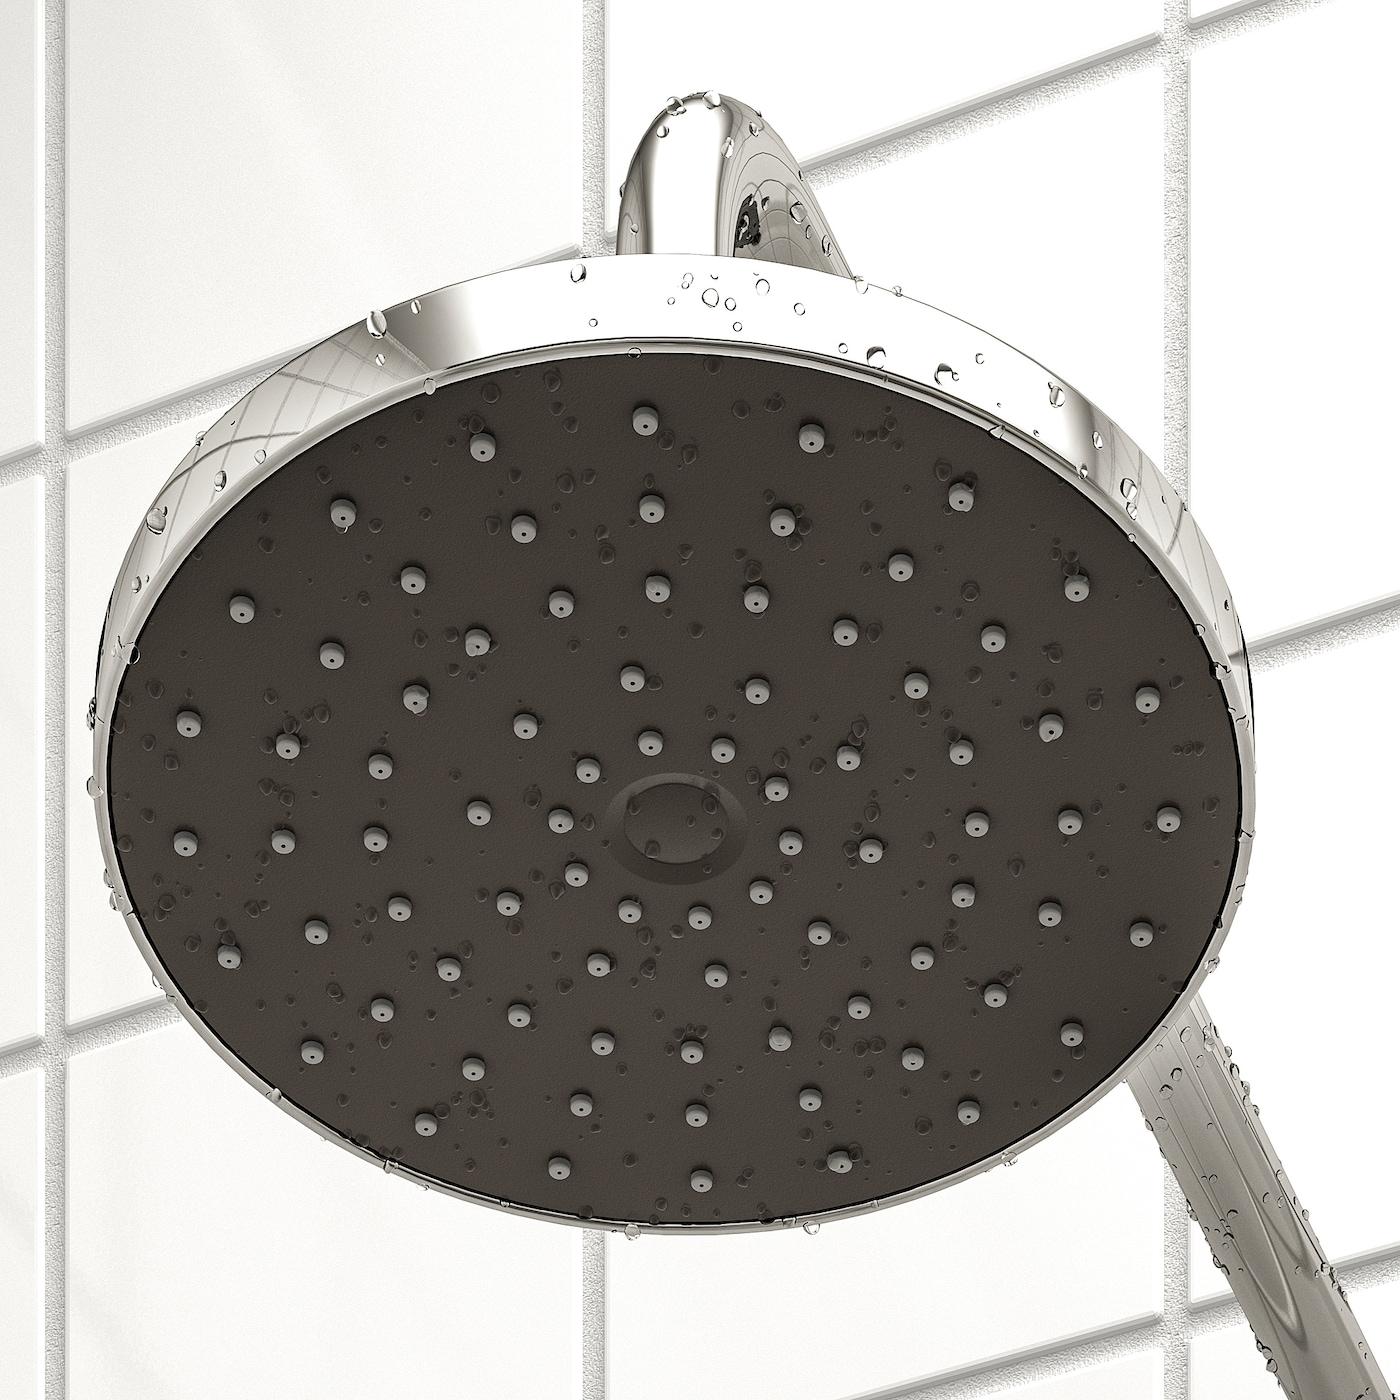 Chrome Plated IKEA 503.858.73 Brogrund 1-Spray Showerhead with Arm